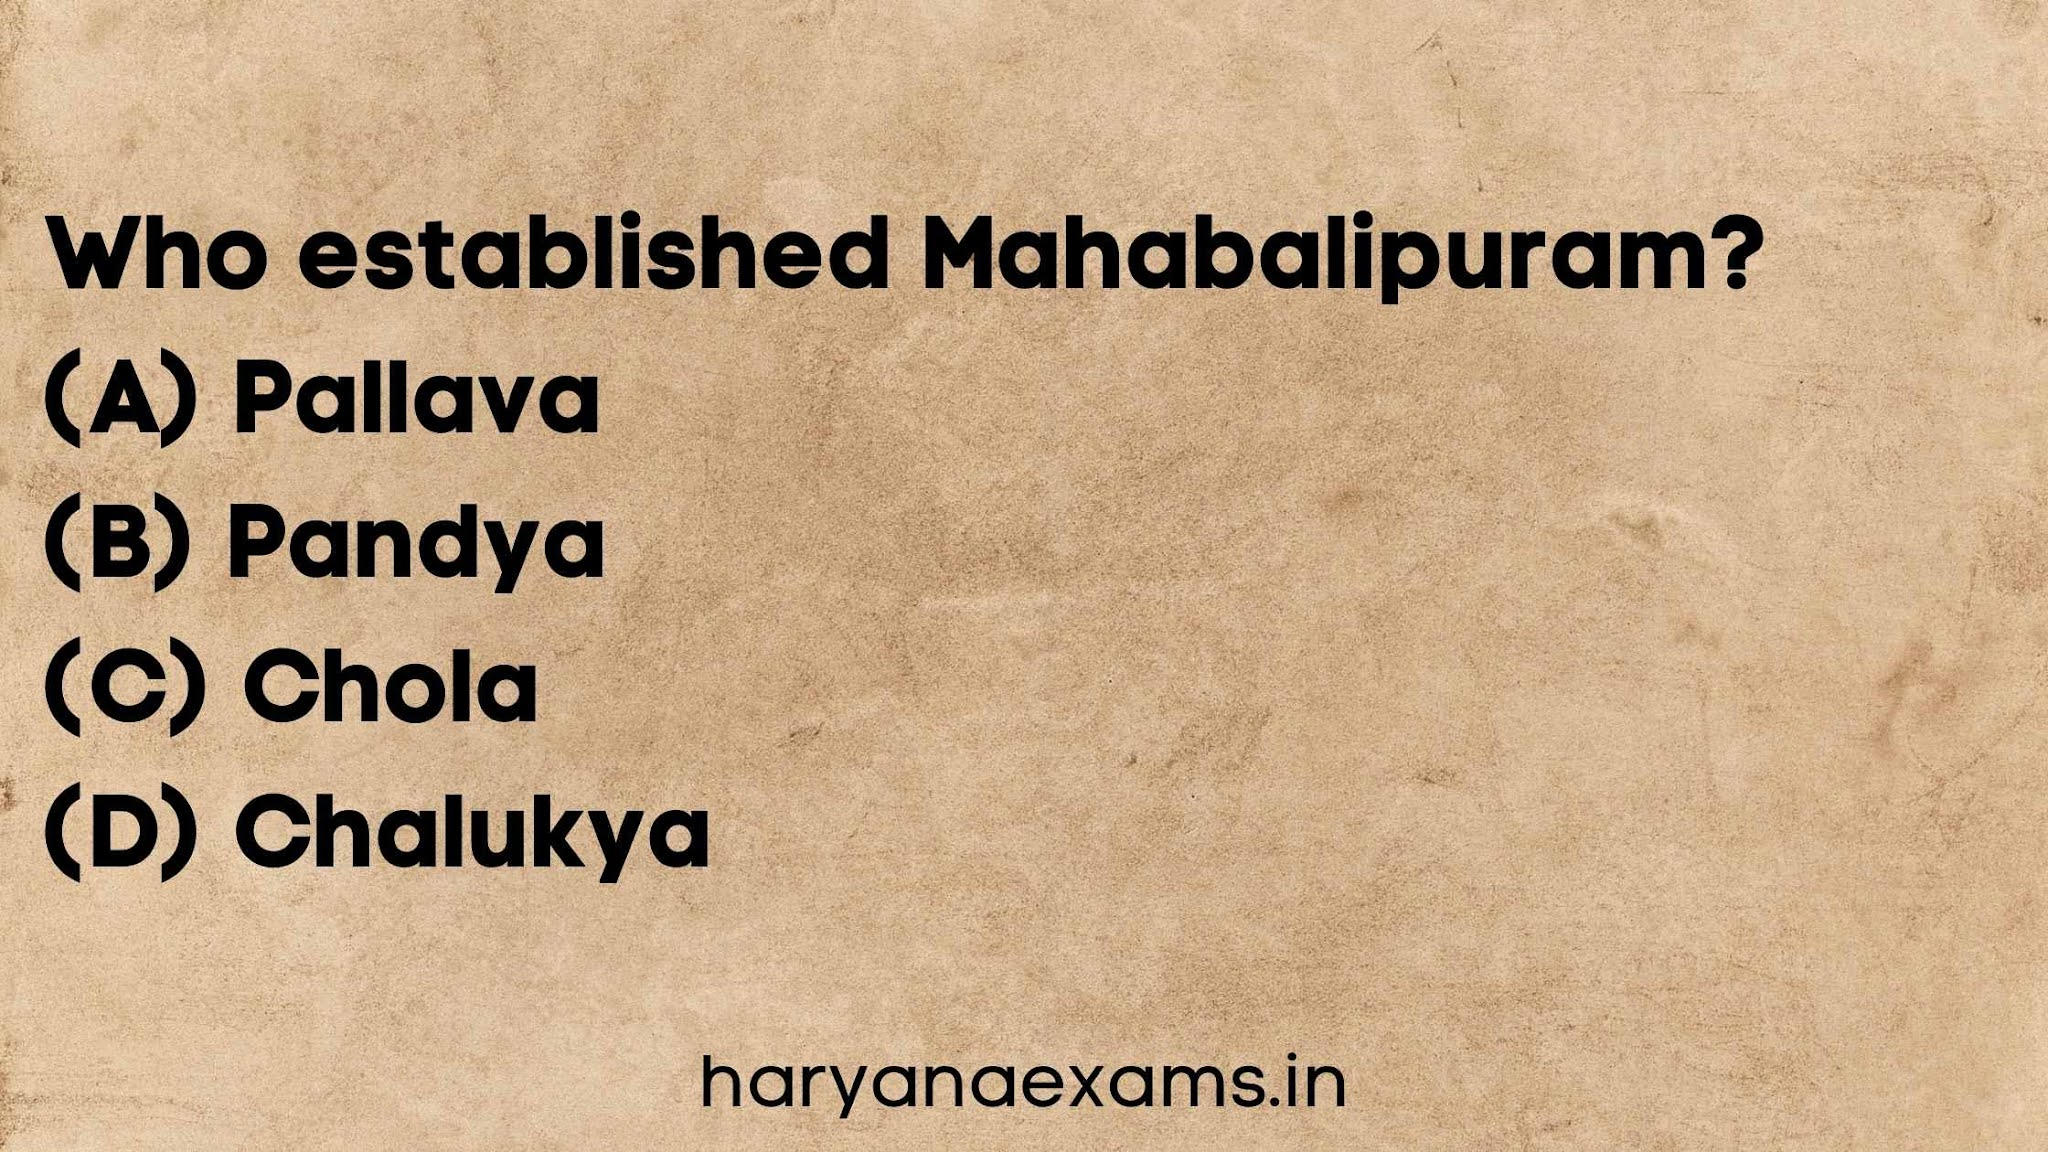 Who established Mahabalipuram?   (A) Pallava   (B) Pandya   (C) Chola   (D) Chalukya